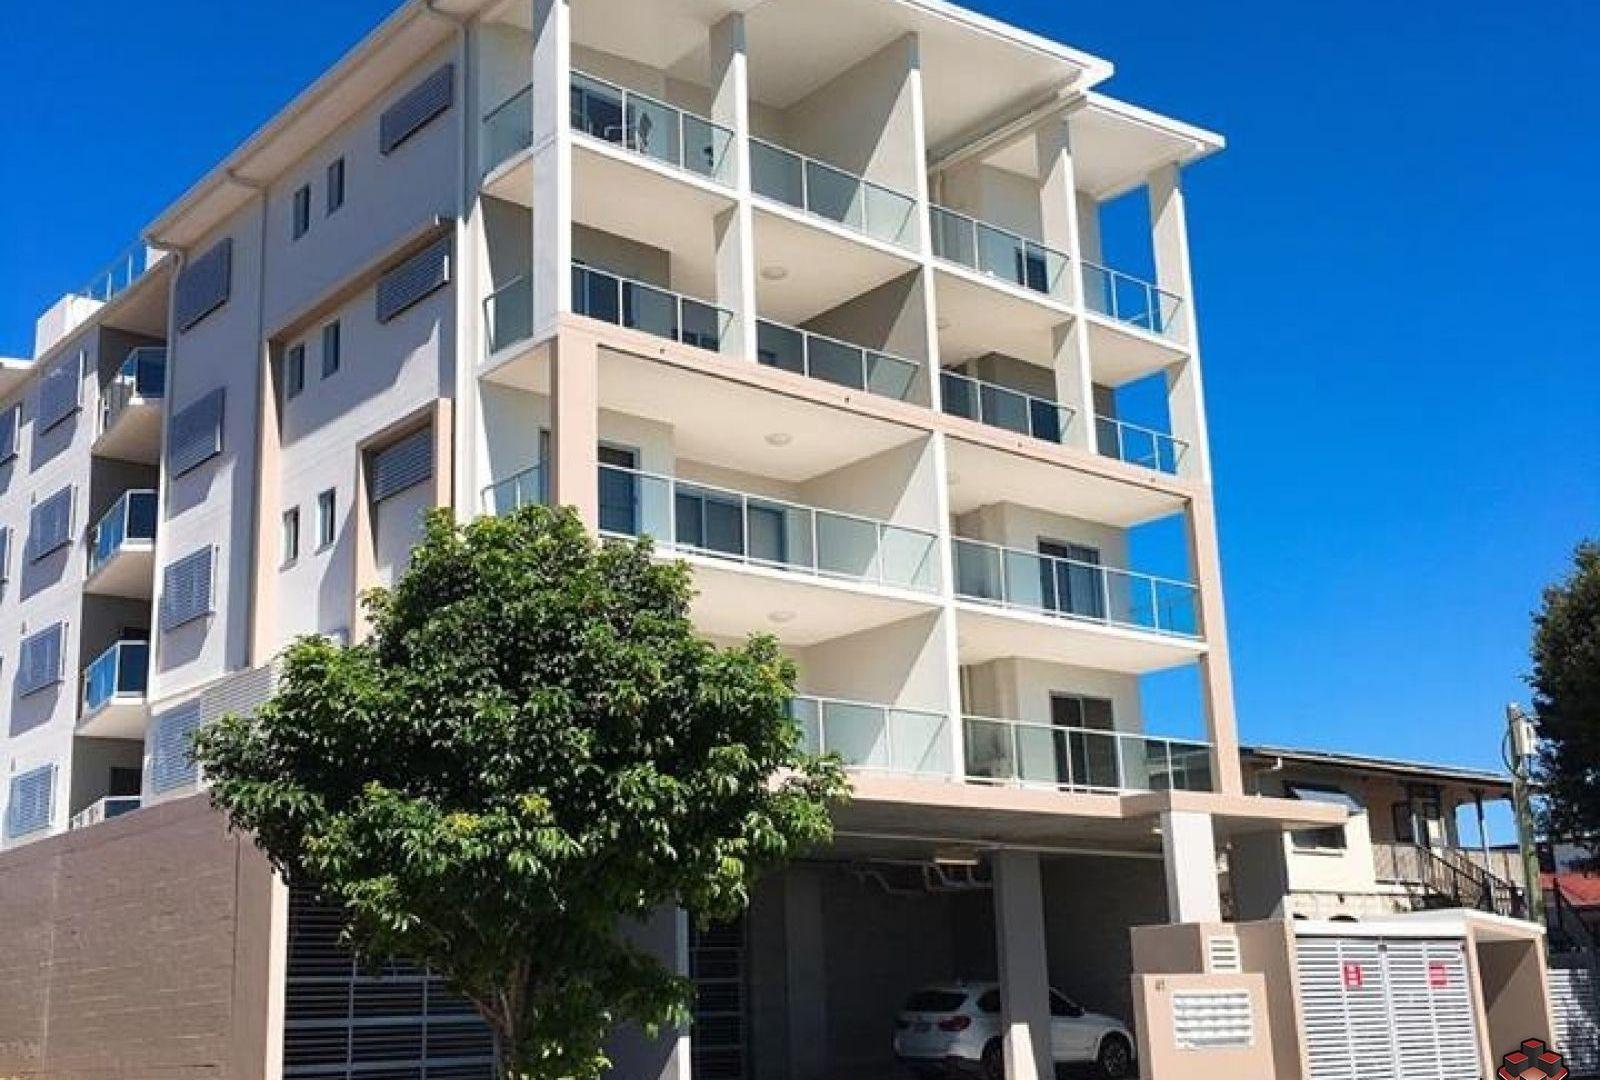 41 Lumley Street, Upper Mount Gravatt QLD 4122, Image 1